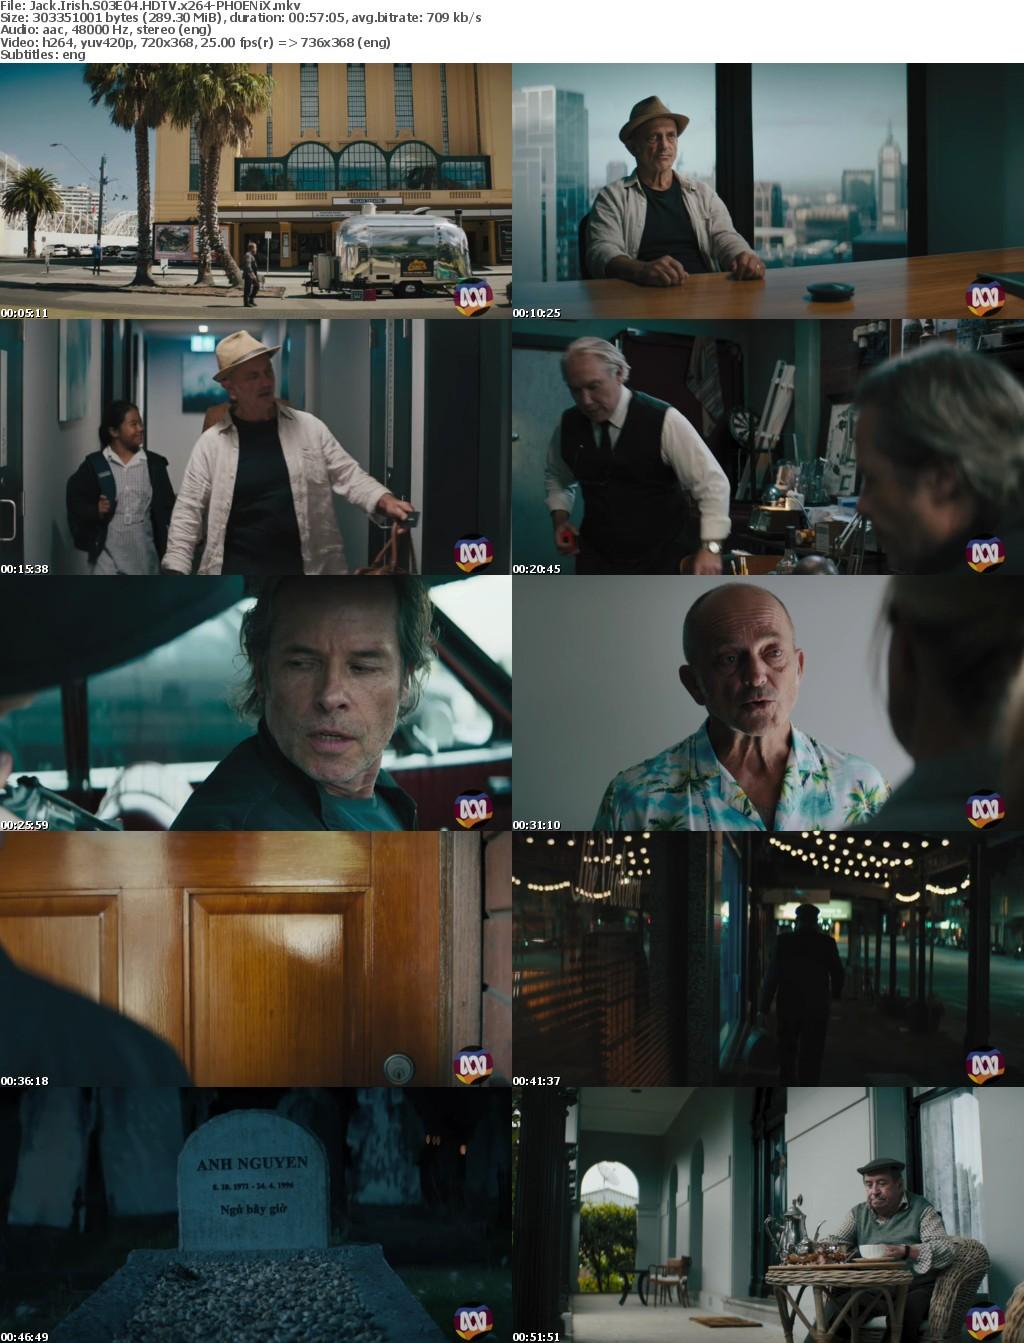 Jack Irish S03E04 HDTV x264-PHOENiX